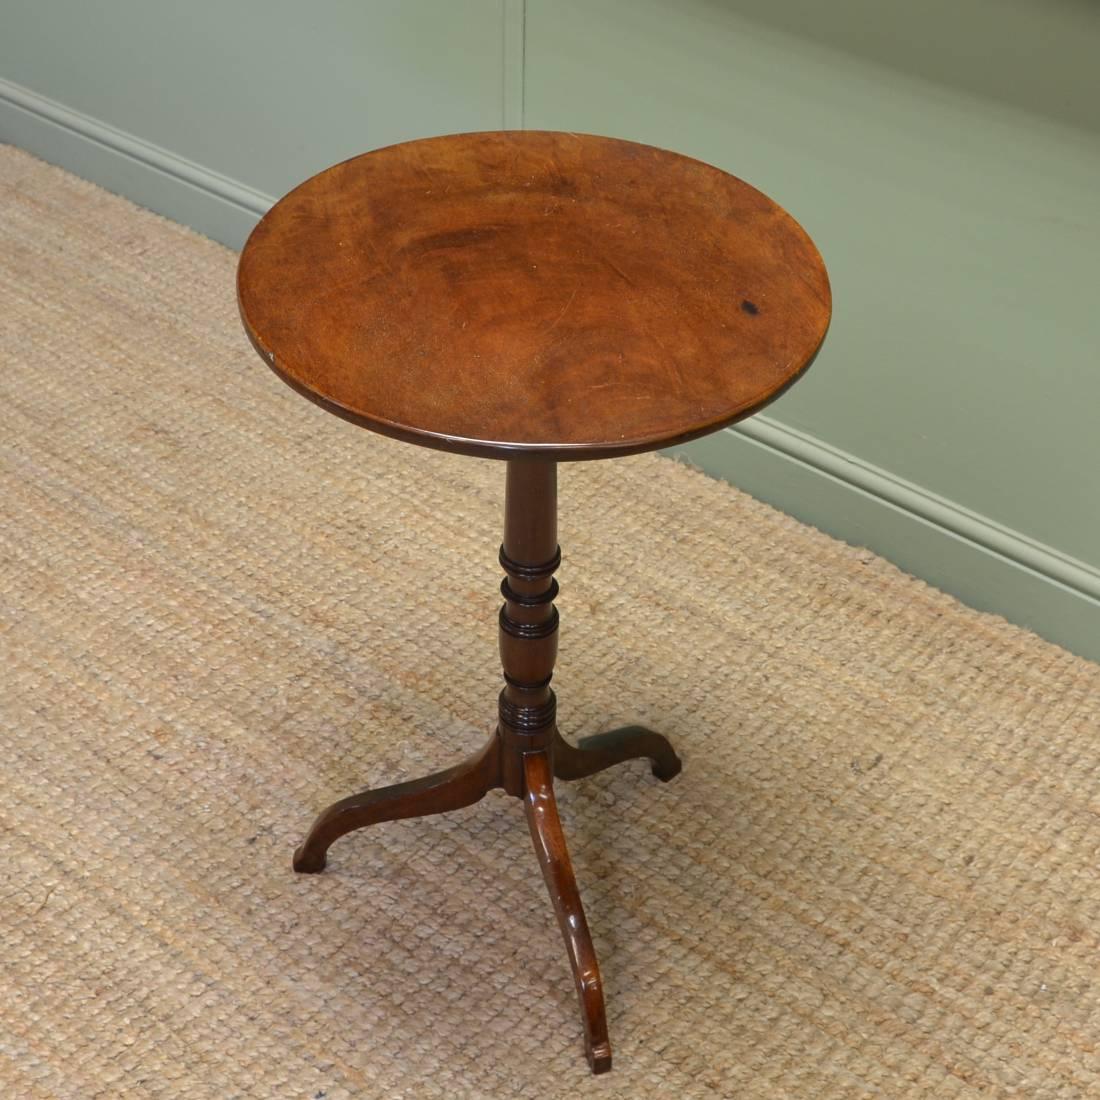 Regency Circular Mahogany Antique Lamp Table